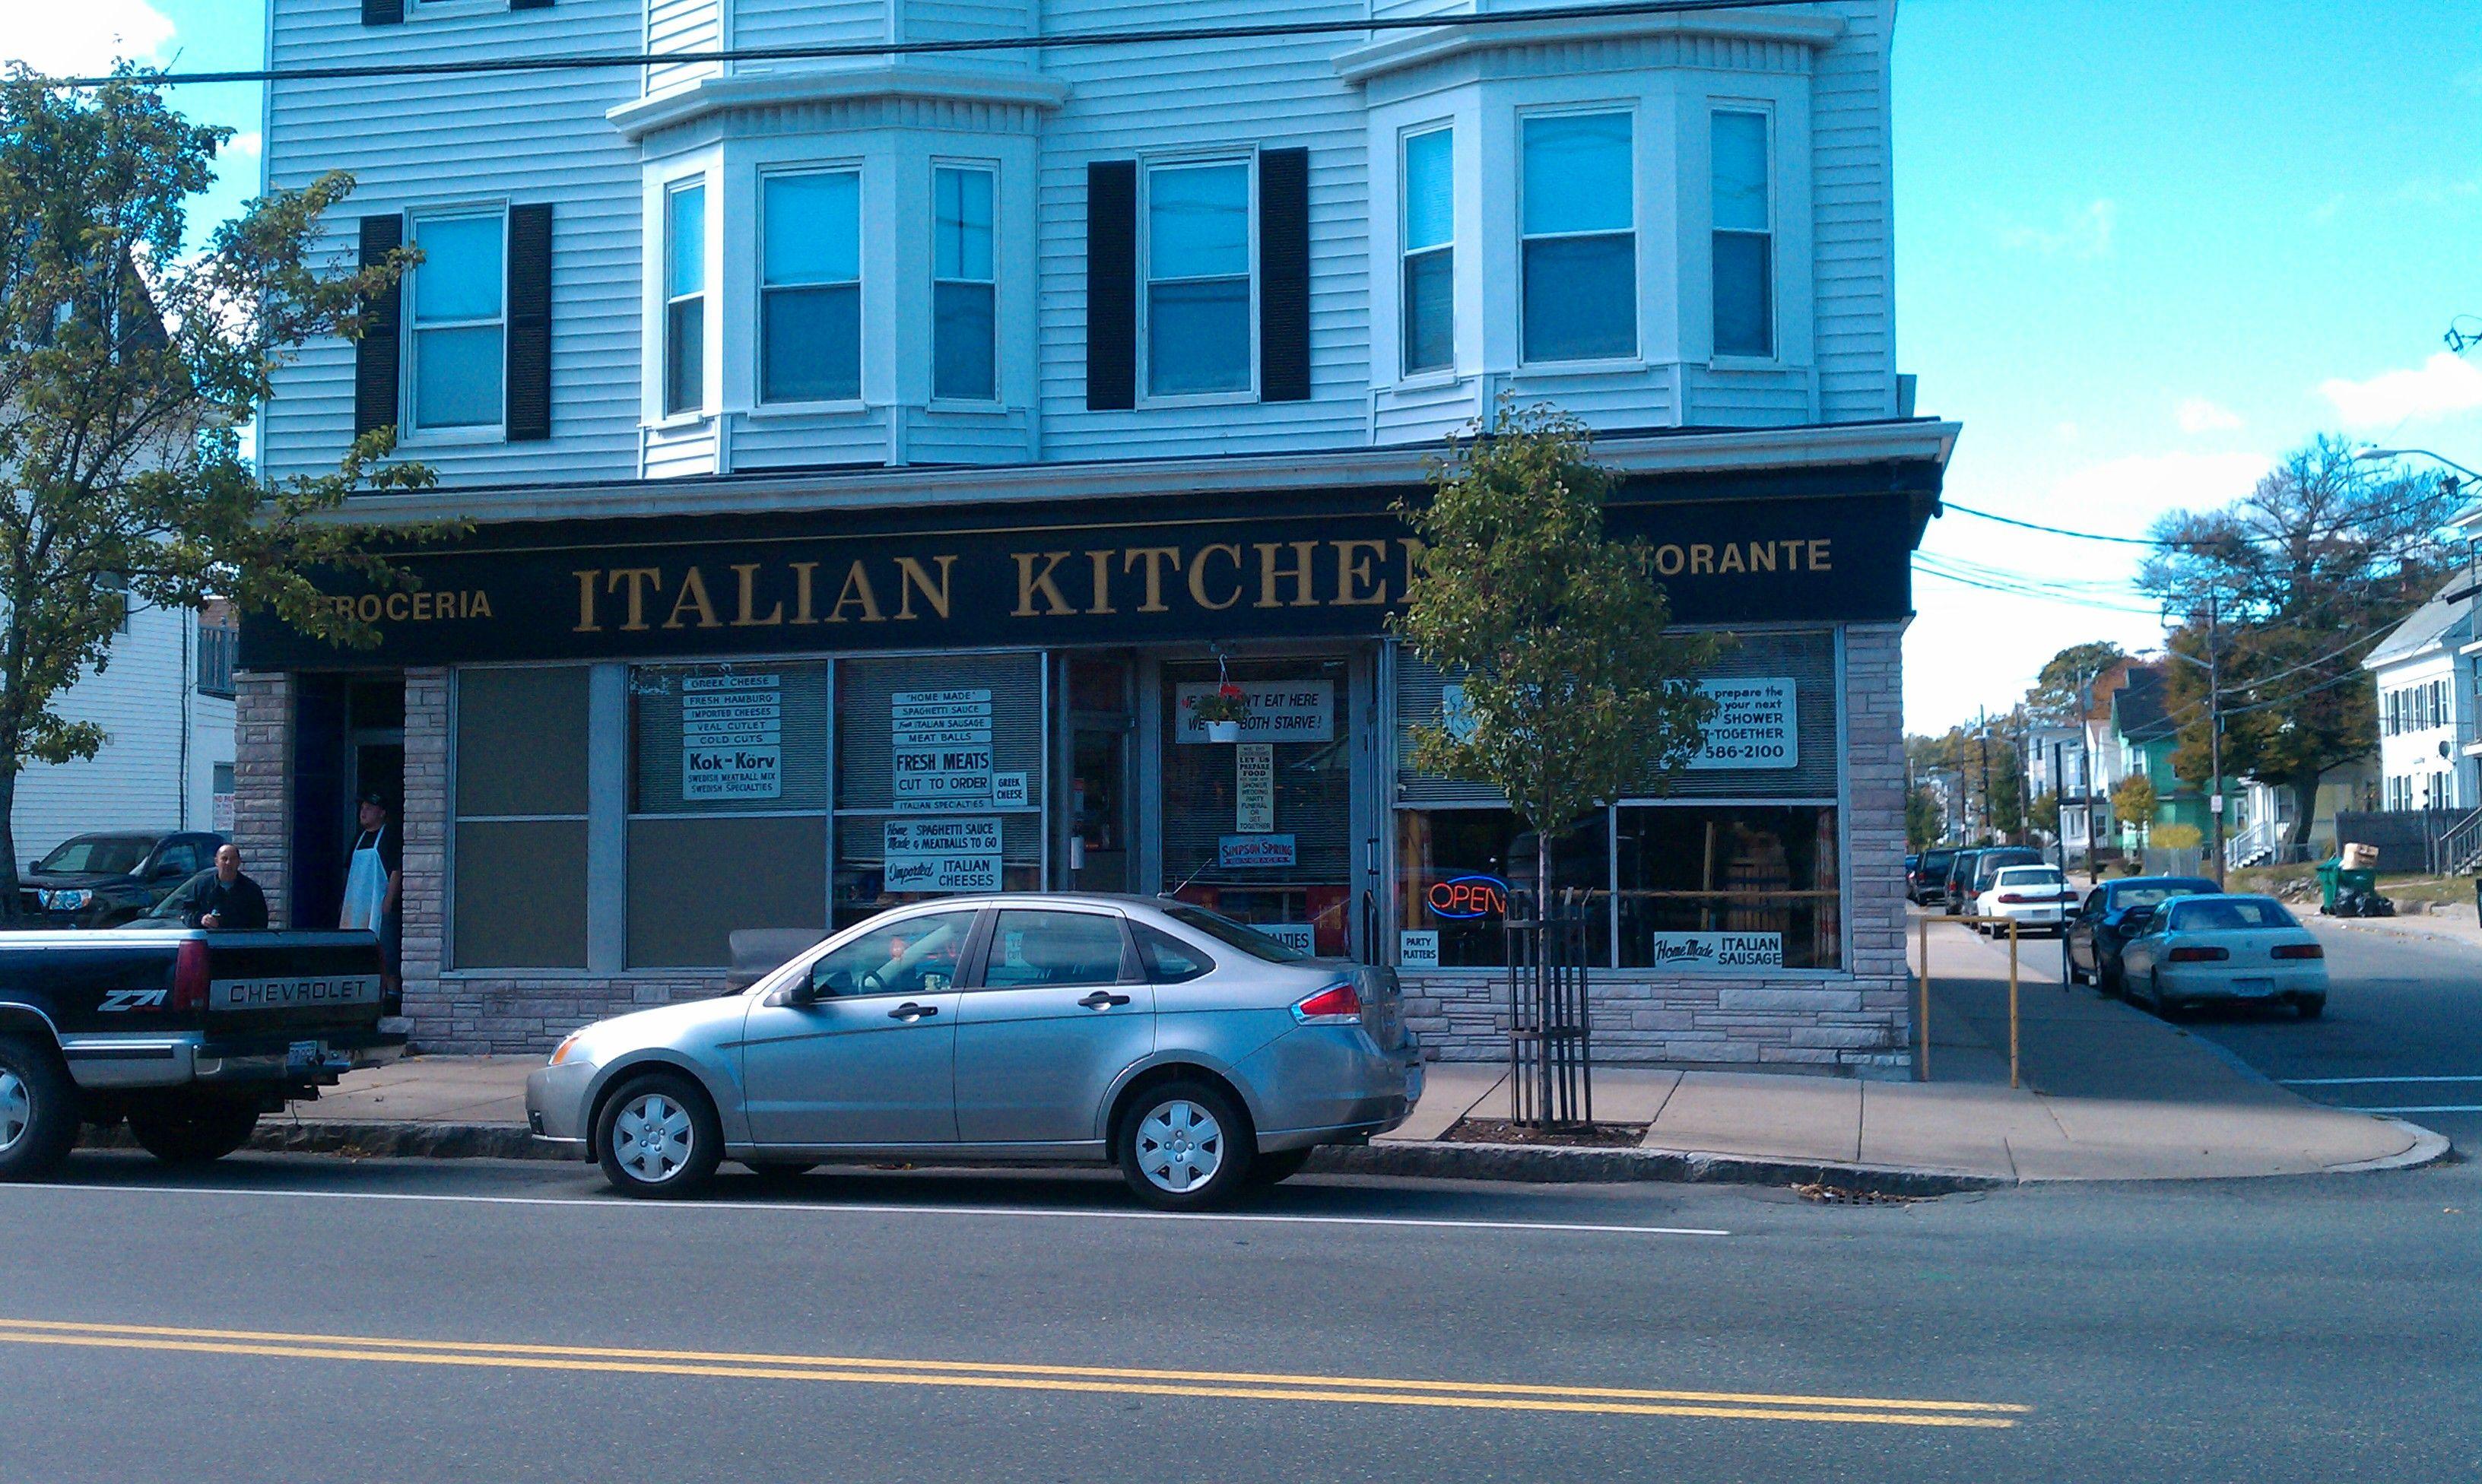 attractive Italian Kitchen Brockton Menu #4: Italian Kitchen Brockton